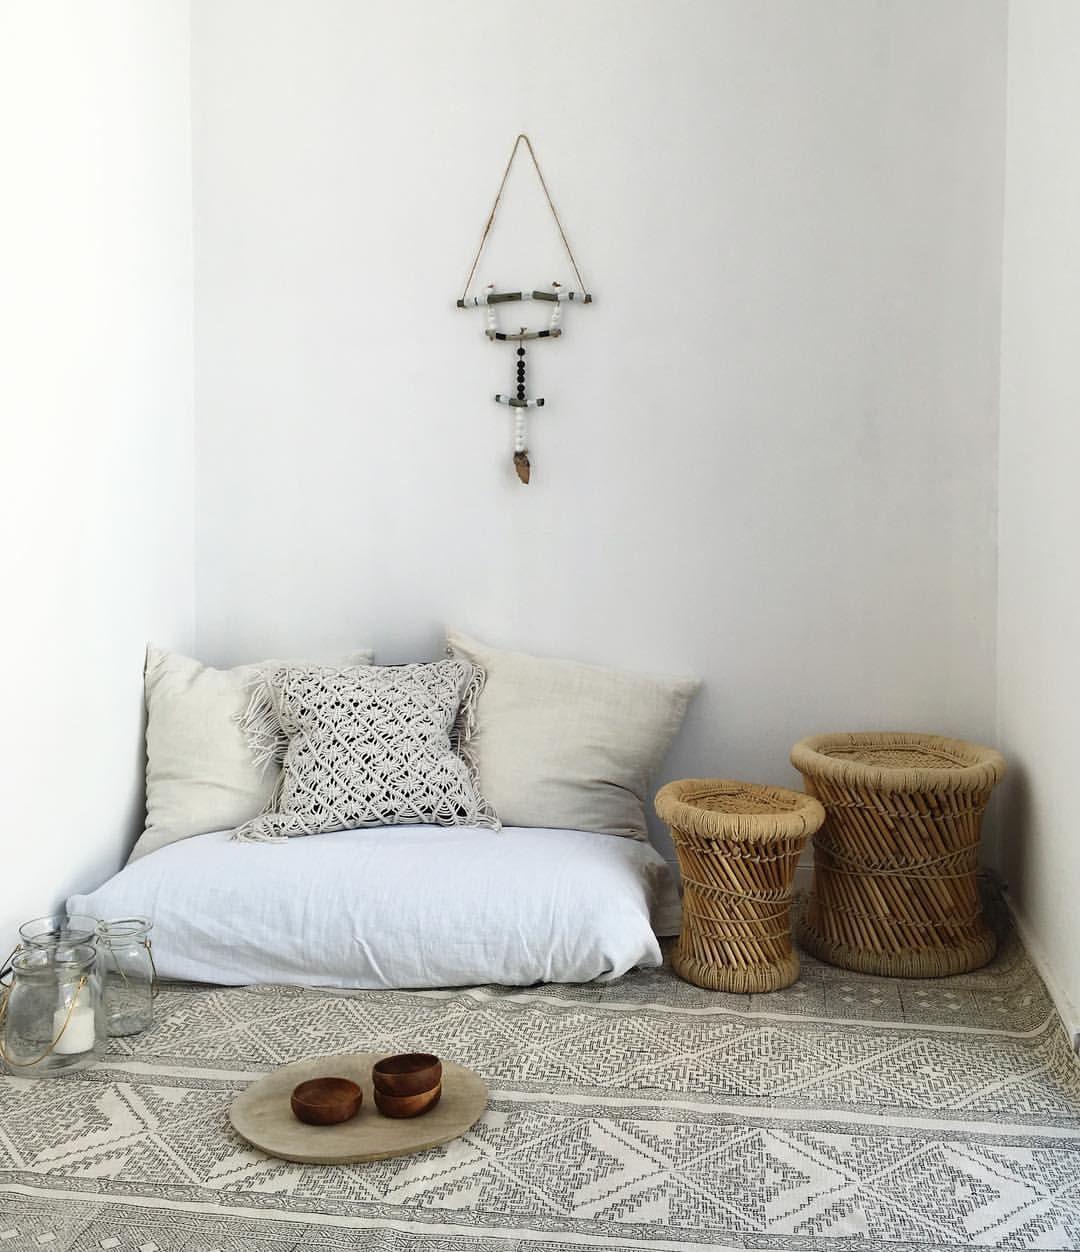 My Little Boho Corner At Home We All Need Some Bohemian Corner In Our Life Bohostyle Minteriordesigner Mi Floor Pillows Boho Floor Pillows Floor Cushions